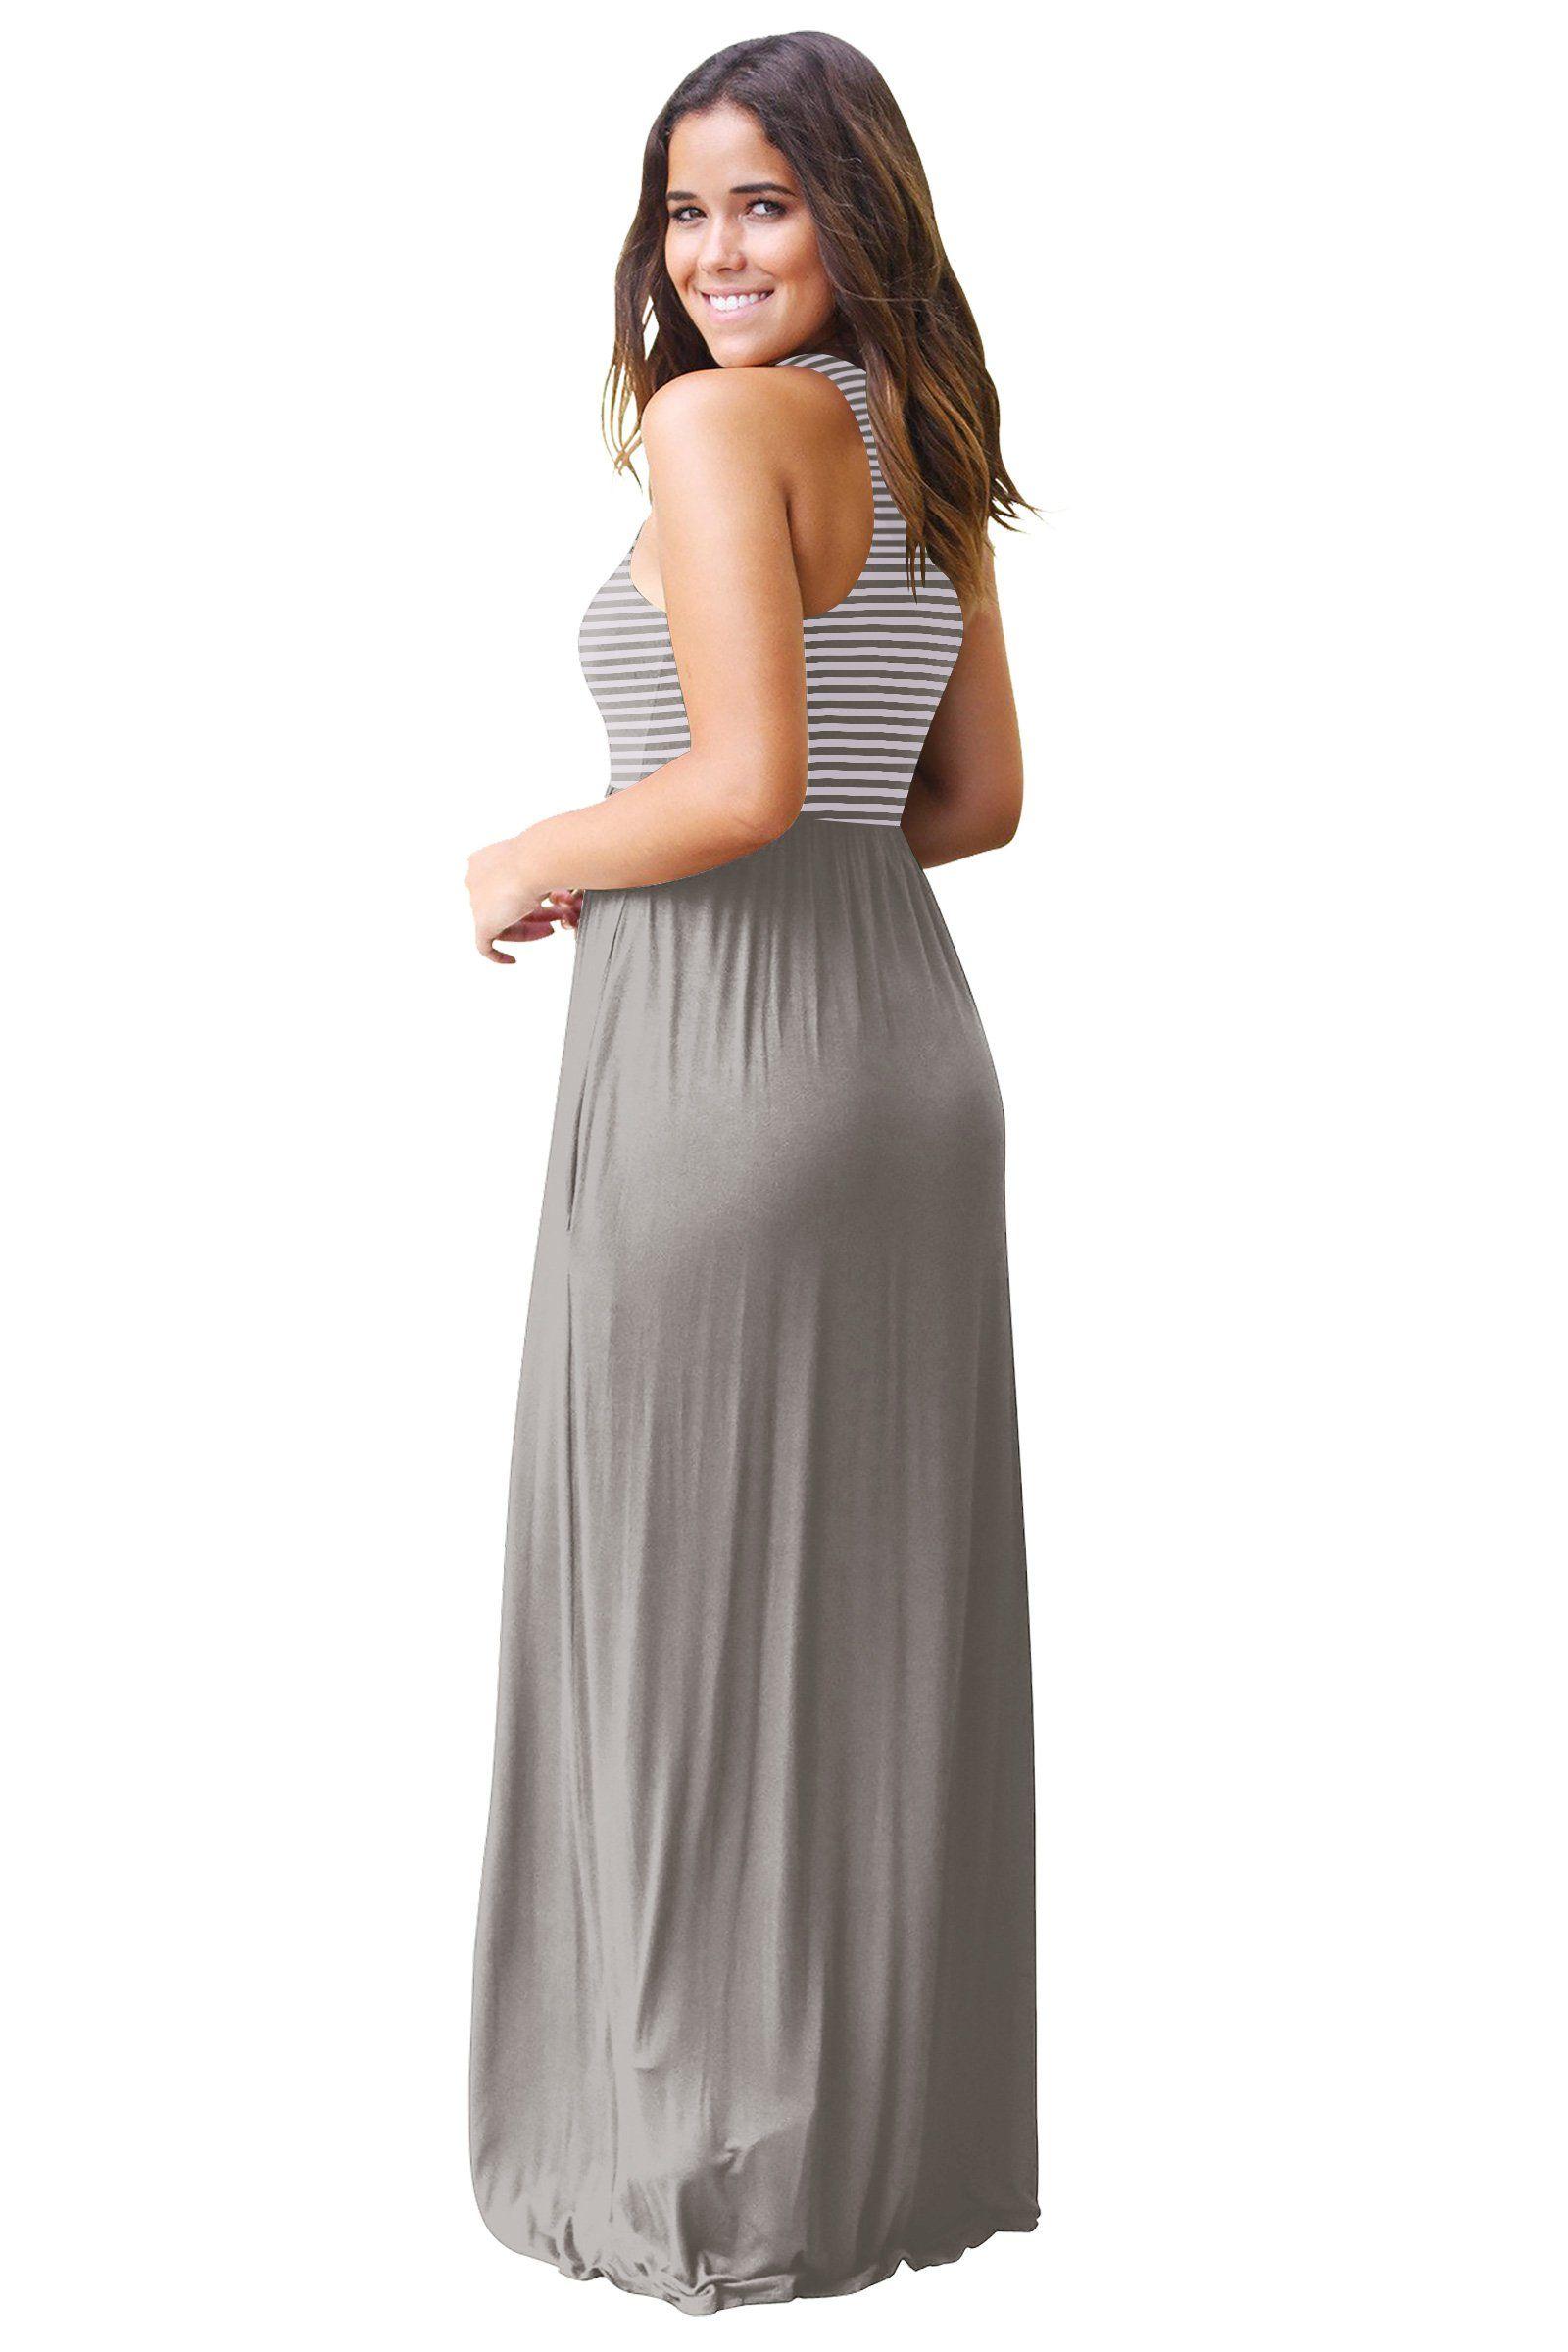 5a31f687b9cbb Maternity Fashion - best maternity maxi dress : IHouse Womens Plus Size  Striped Boho Beach Summer Sundrss Long Maxi Dress Silver L ** Learn more by  seeing ...